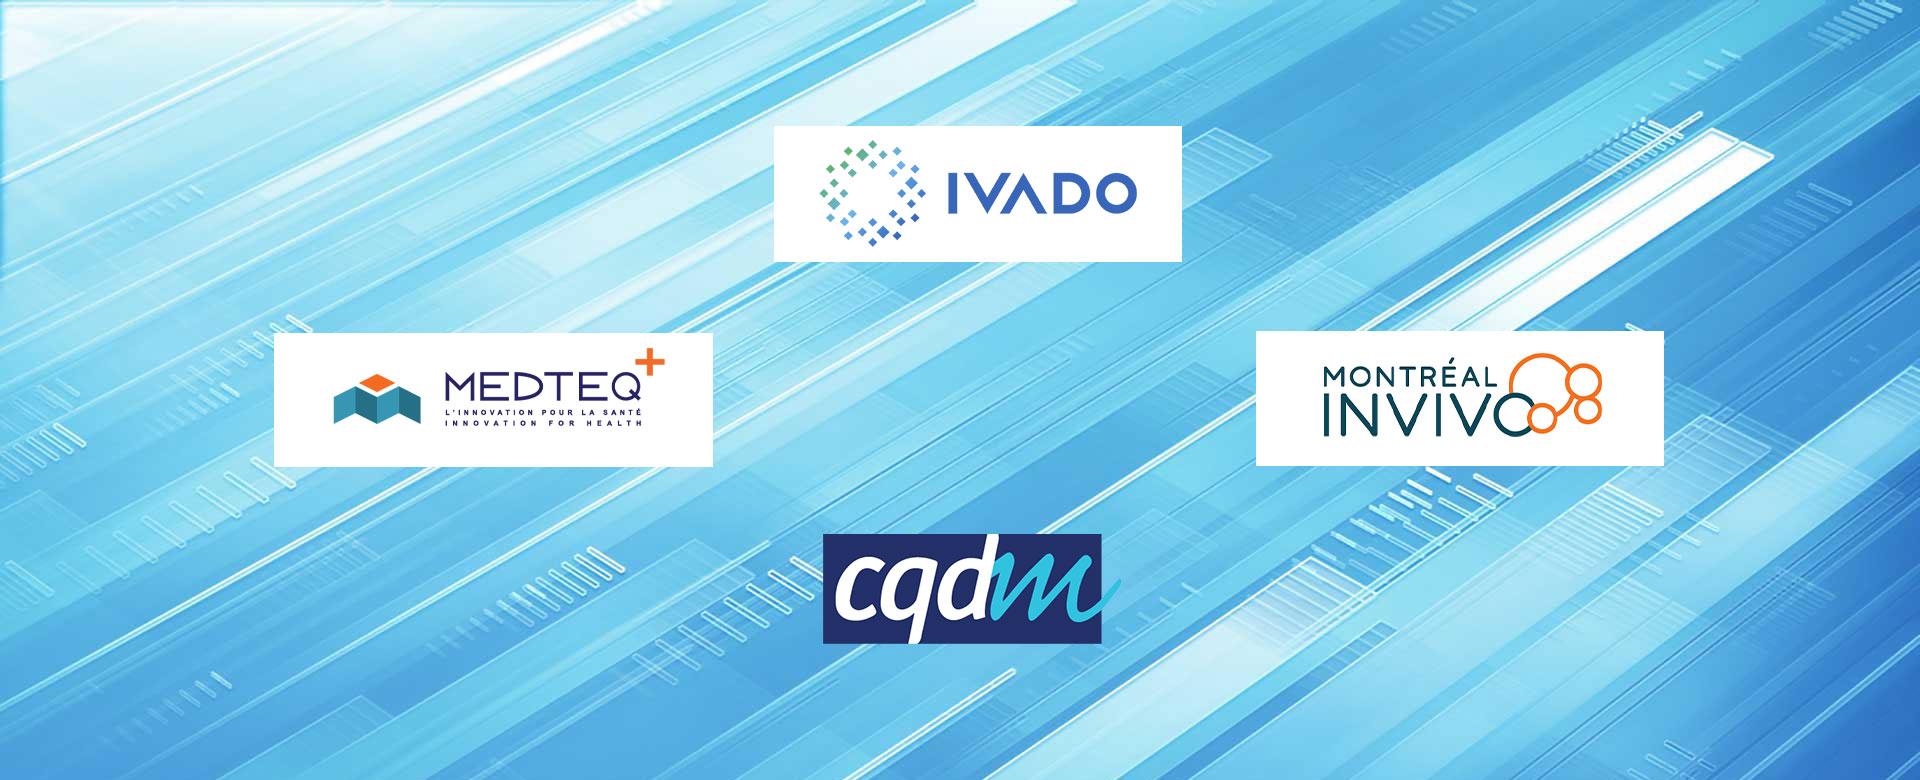 IVADO-Partnership-CQDM-Montreal-InVivo-MEDTEQ+